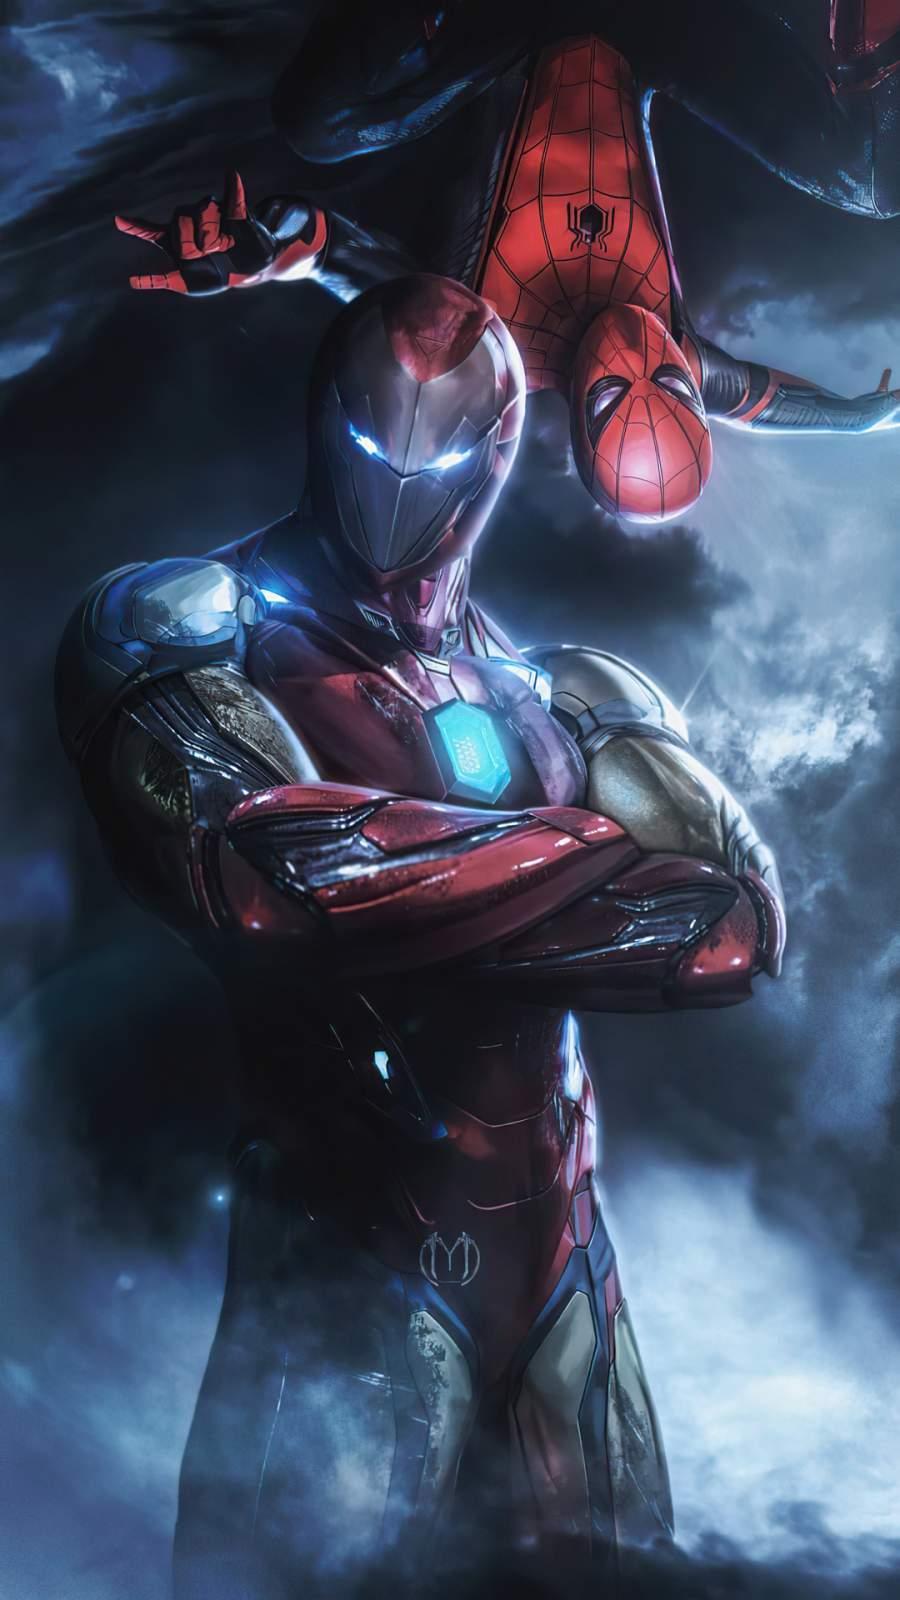 Spiderman Iron Man Mentor